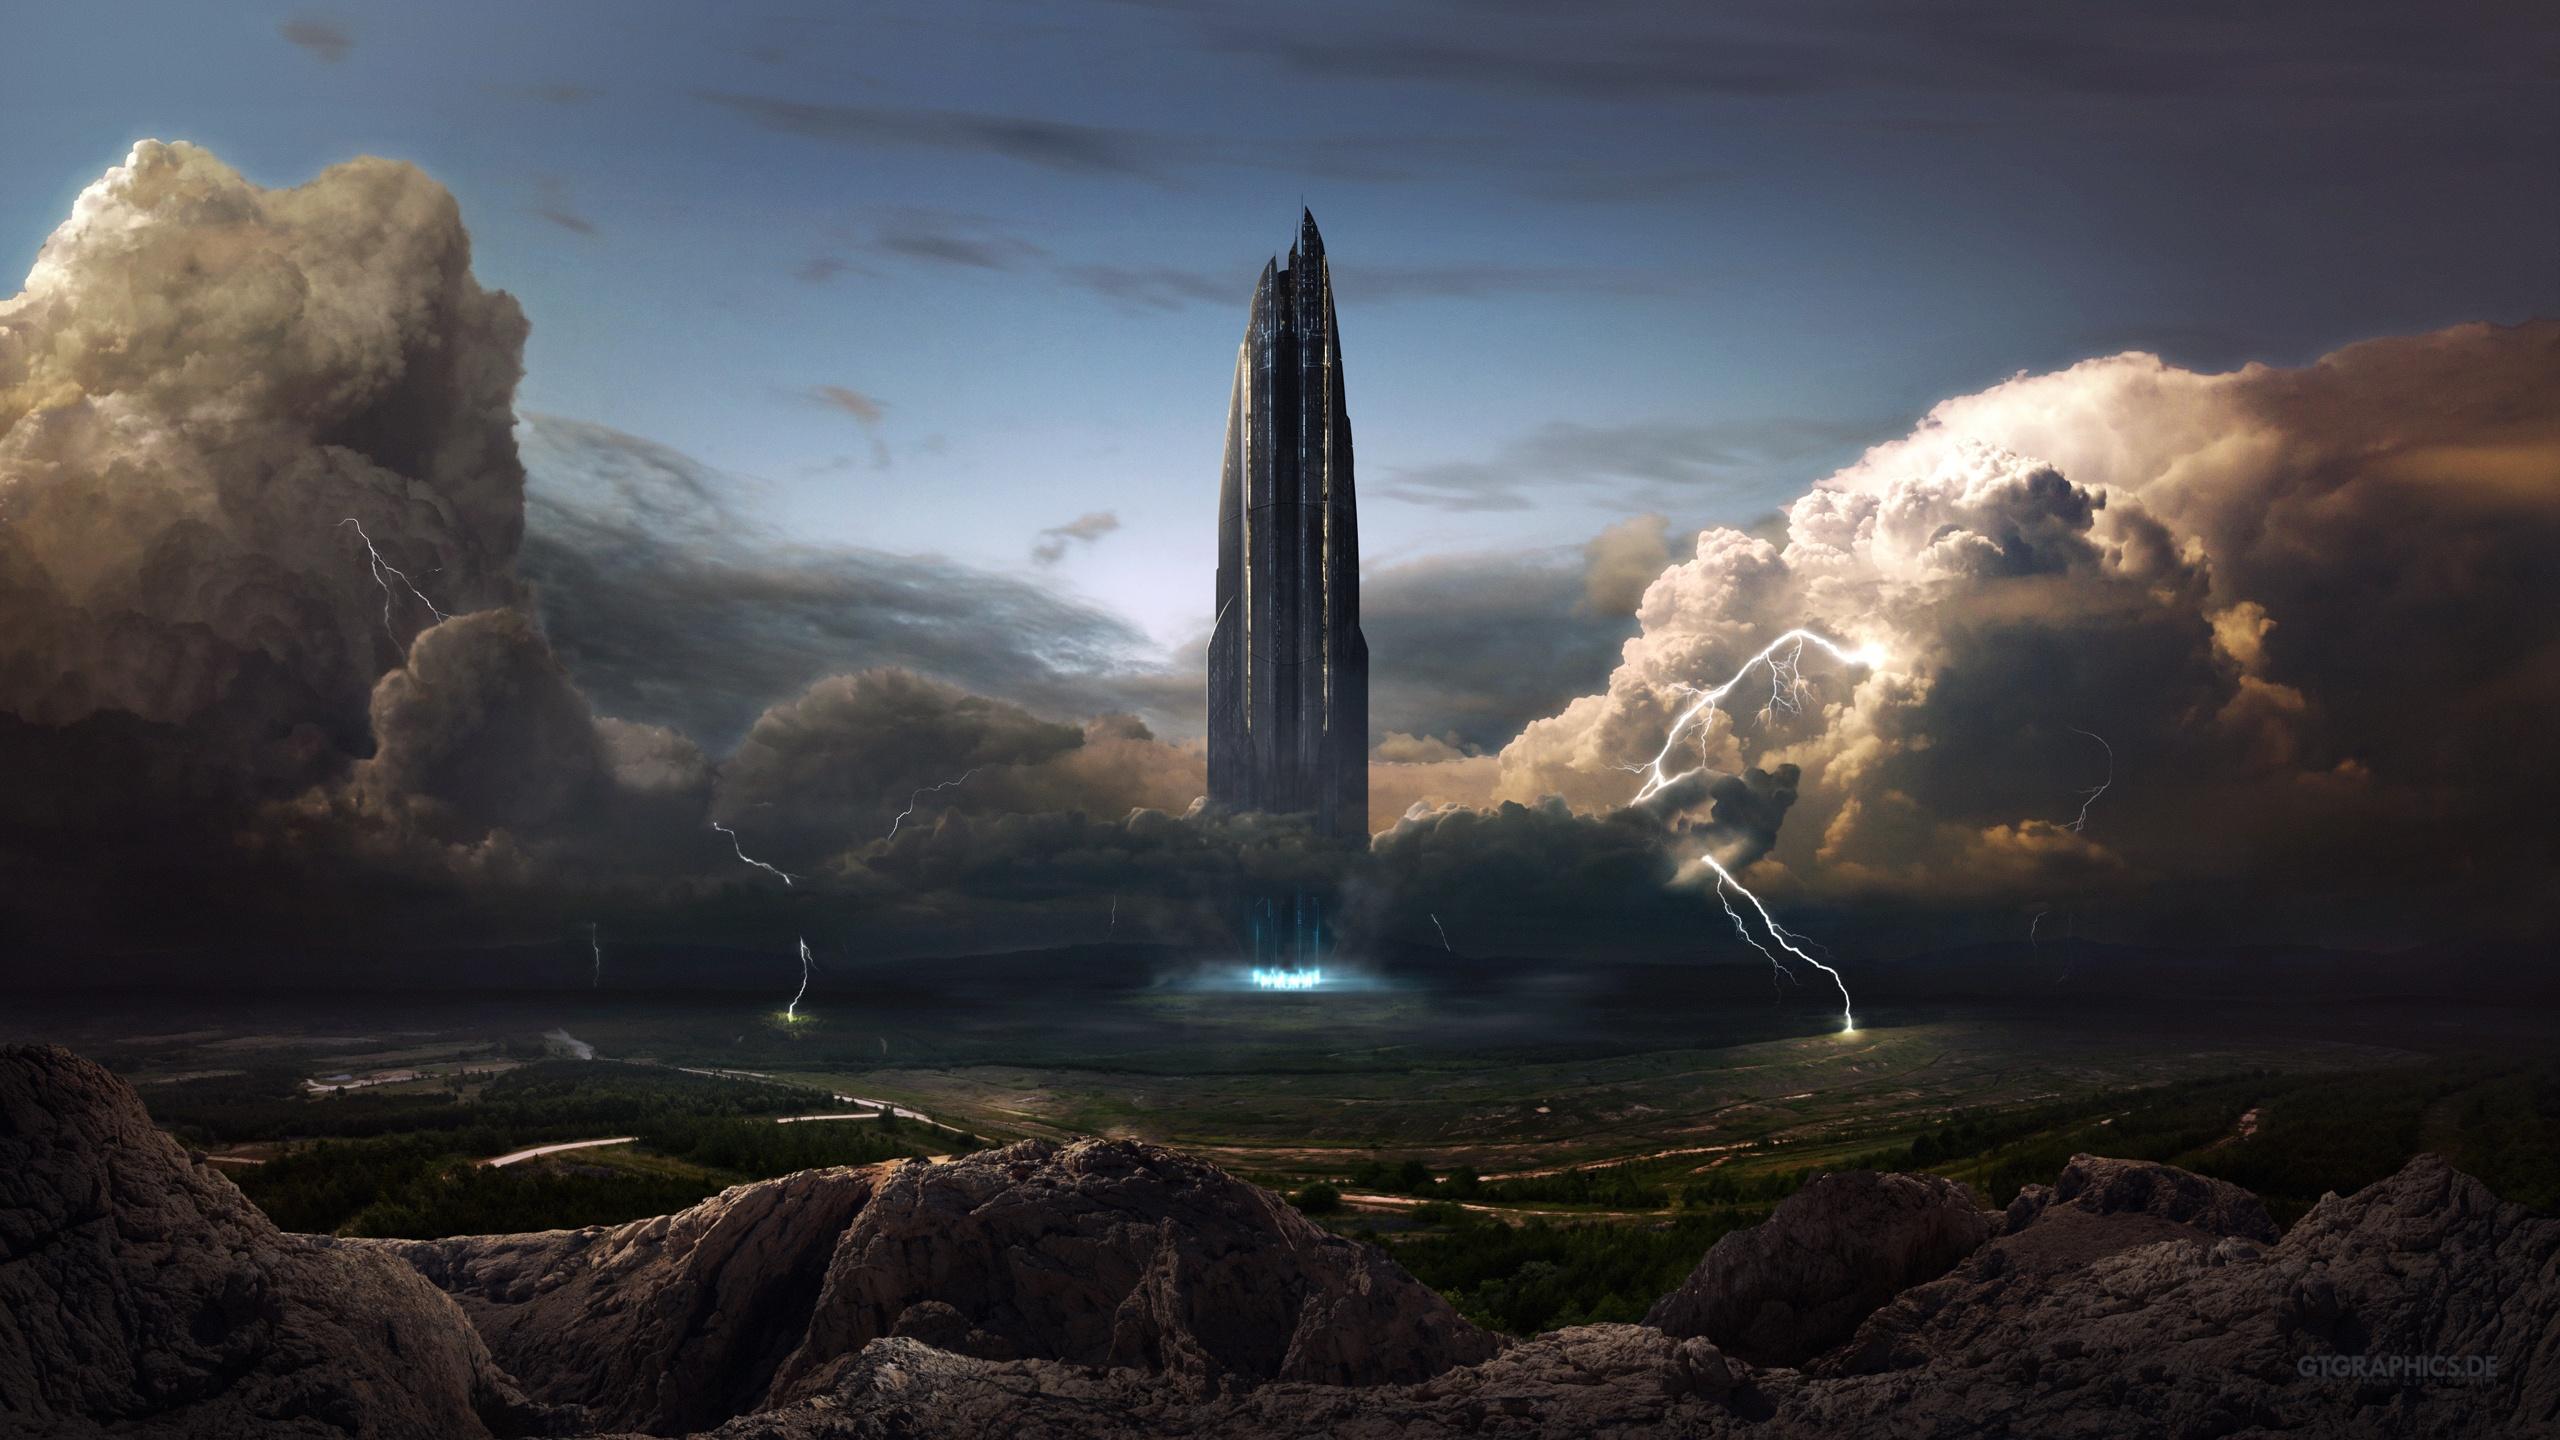 Sci Fi Landscape Wallpaper Hd Wallpapersafari